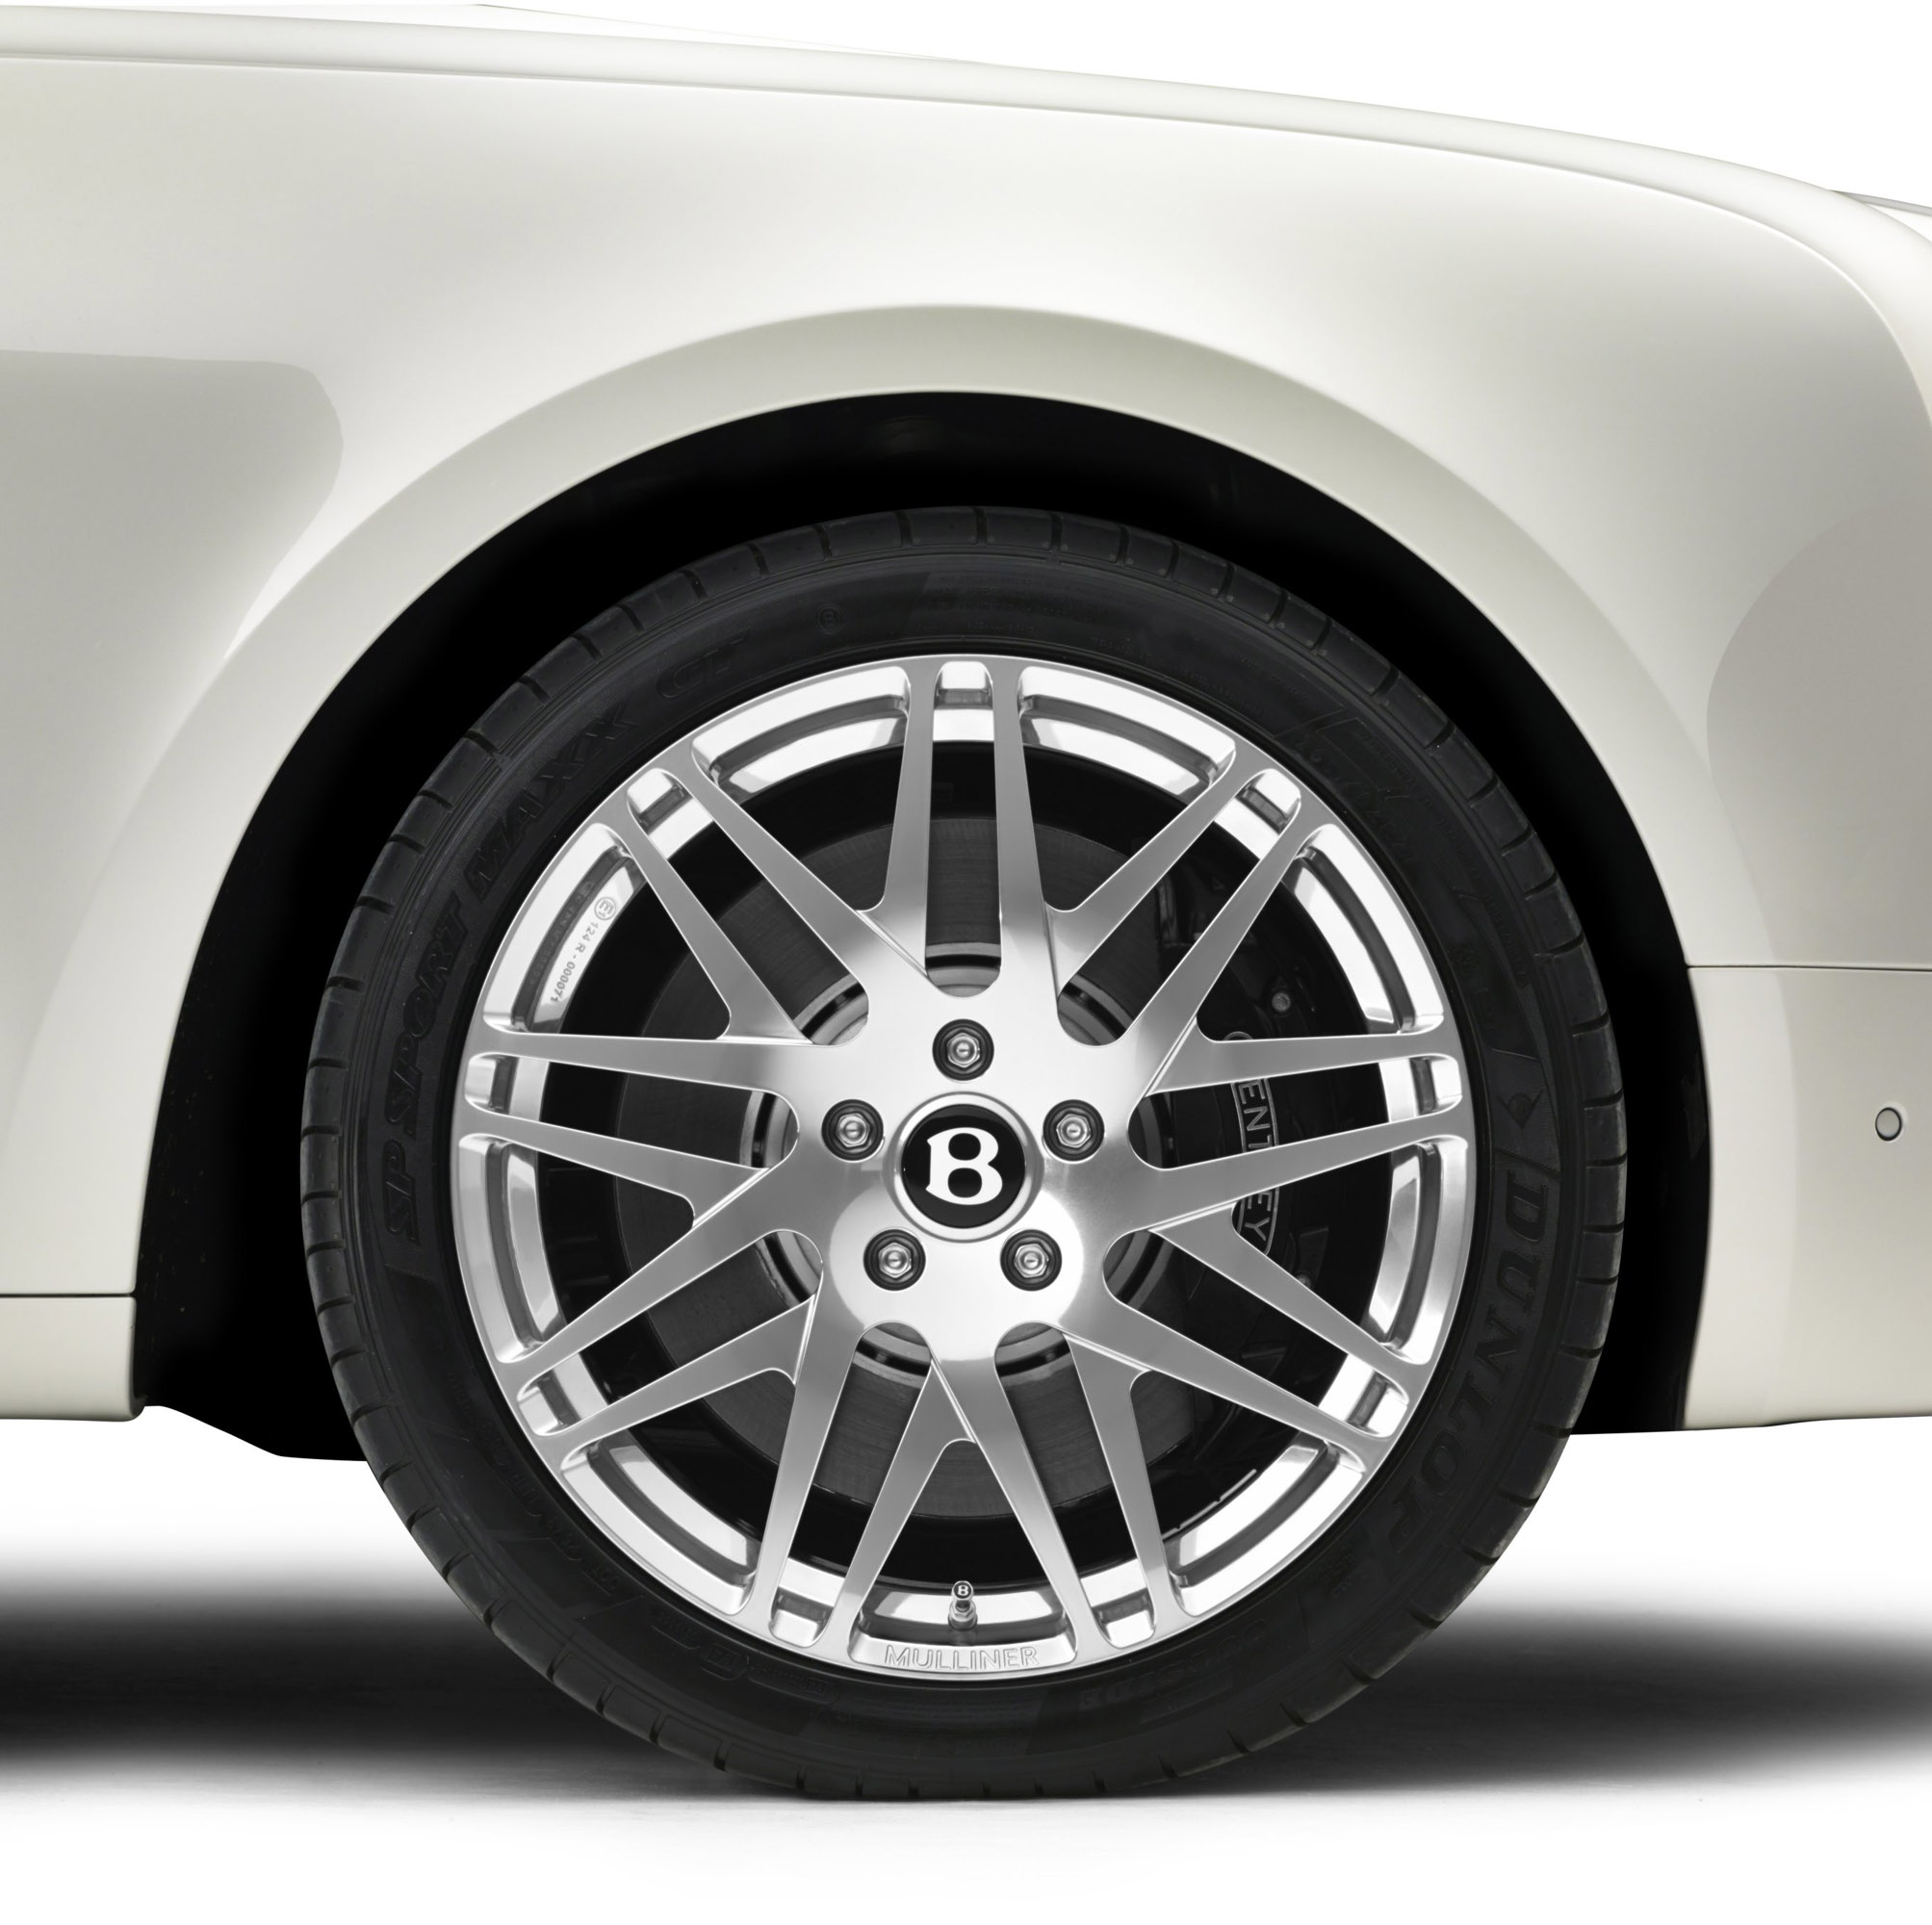 Manhart BMW M3 E92 MH3 V8 R Biturbo Convertible Produces